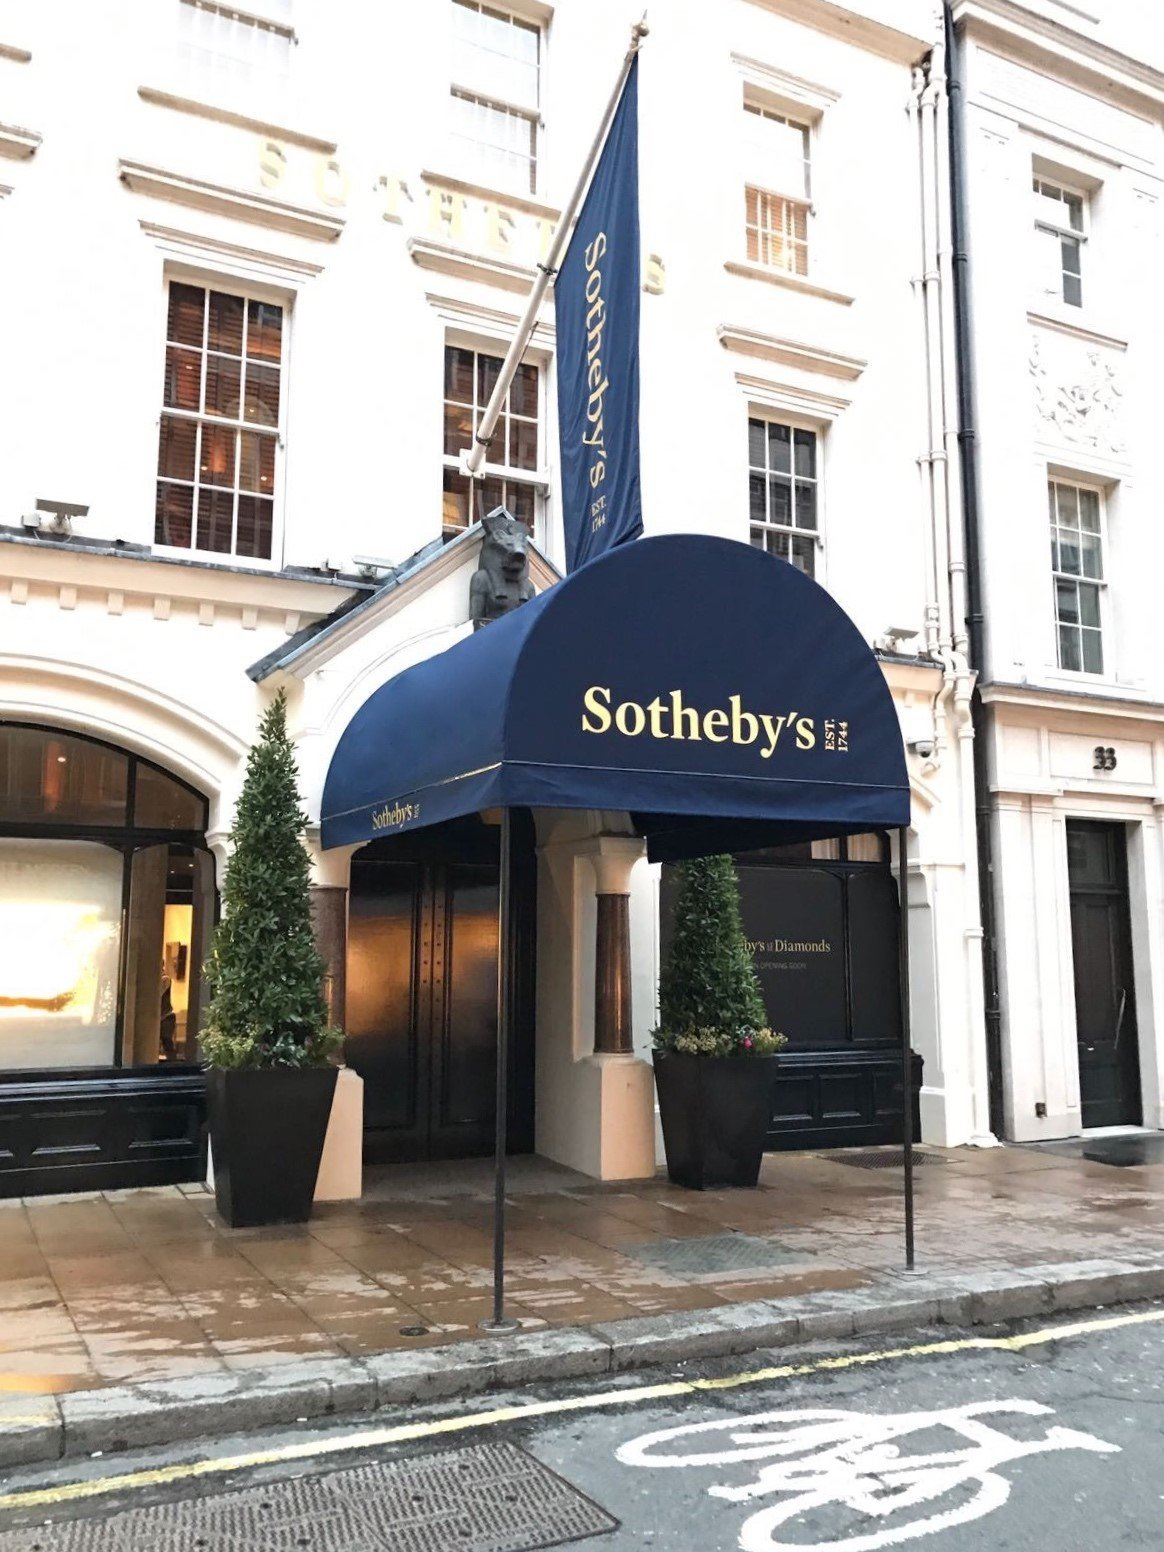 Sothebys awning 1a